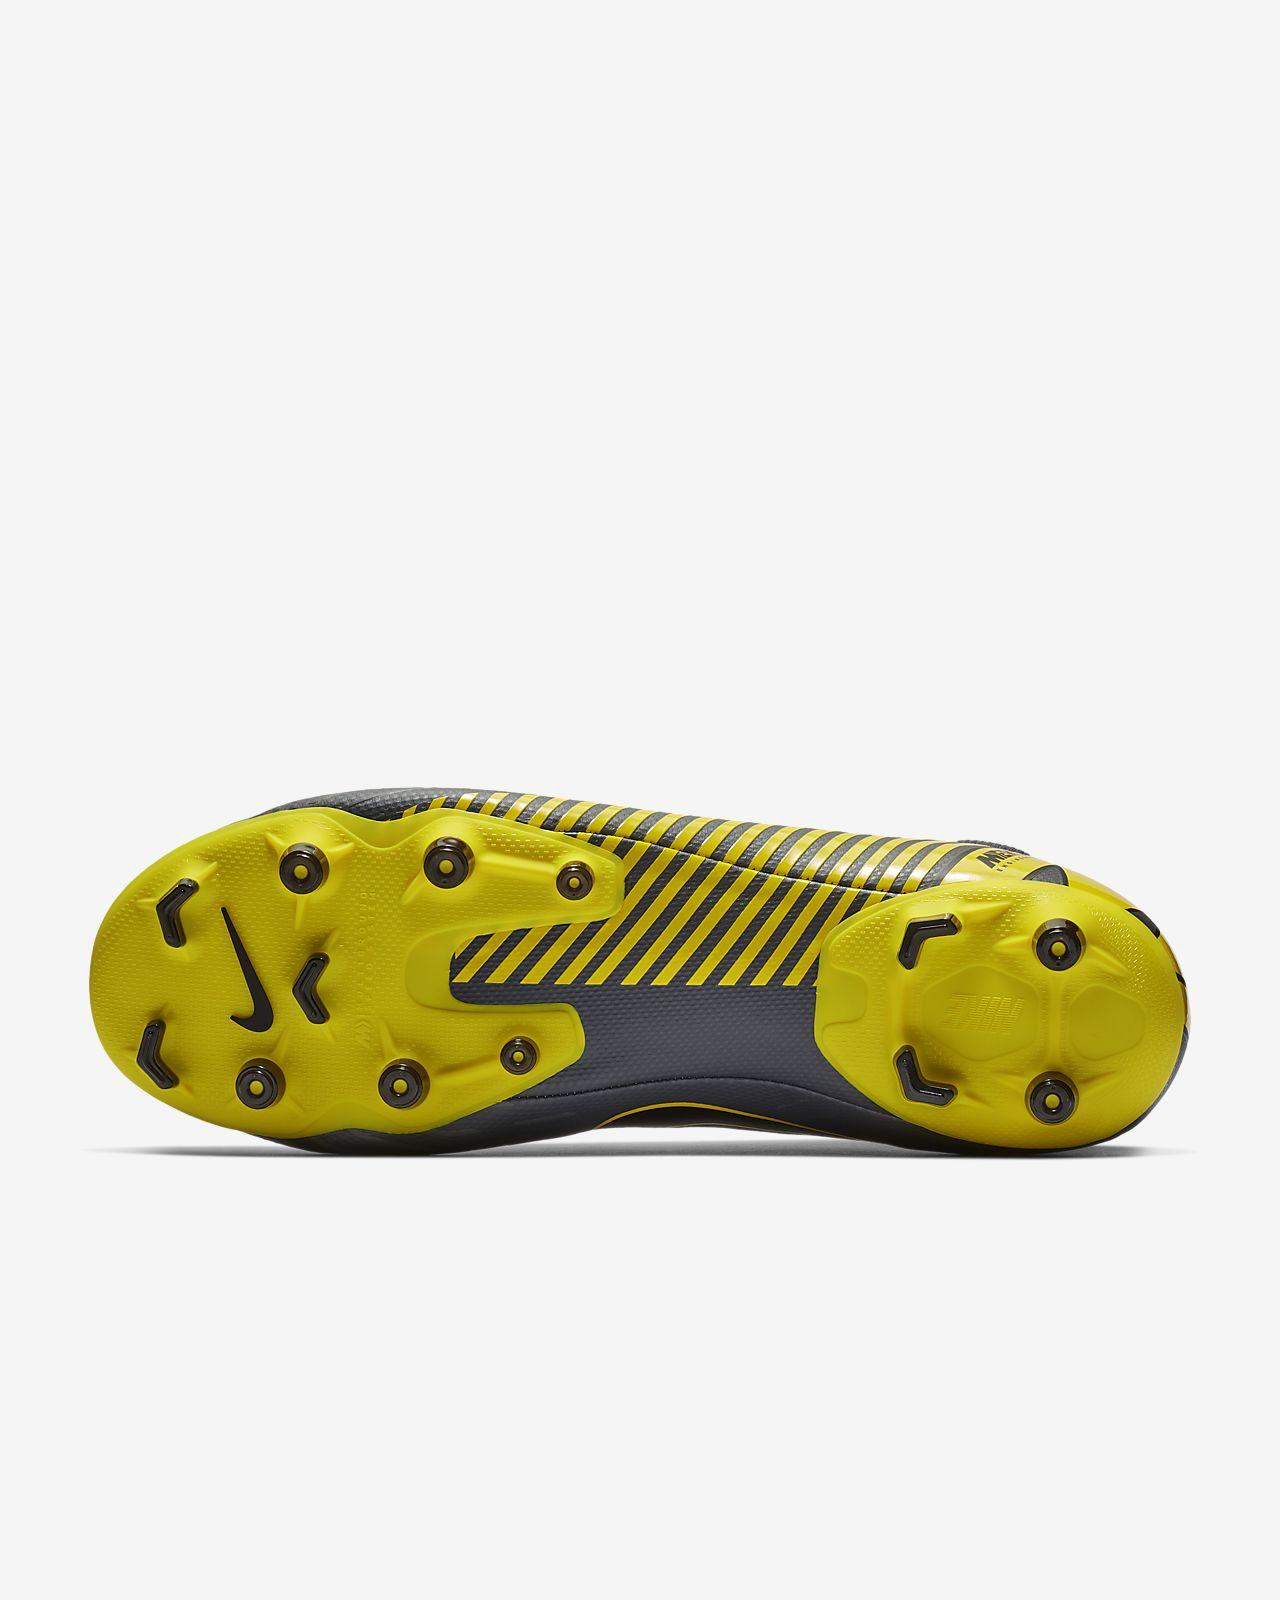 a421cc8a221d4 Nike Mercurial Superfly 6 Academy MG Multi-Ground Football Boot ...